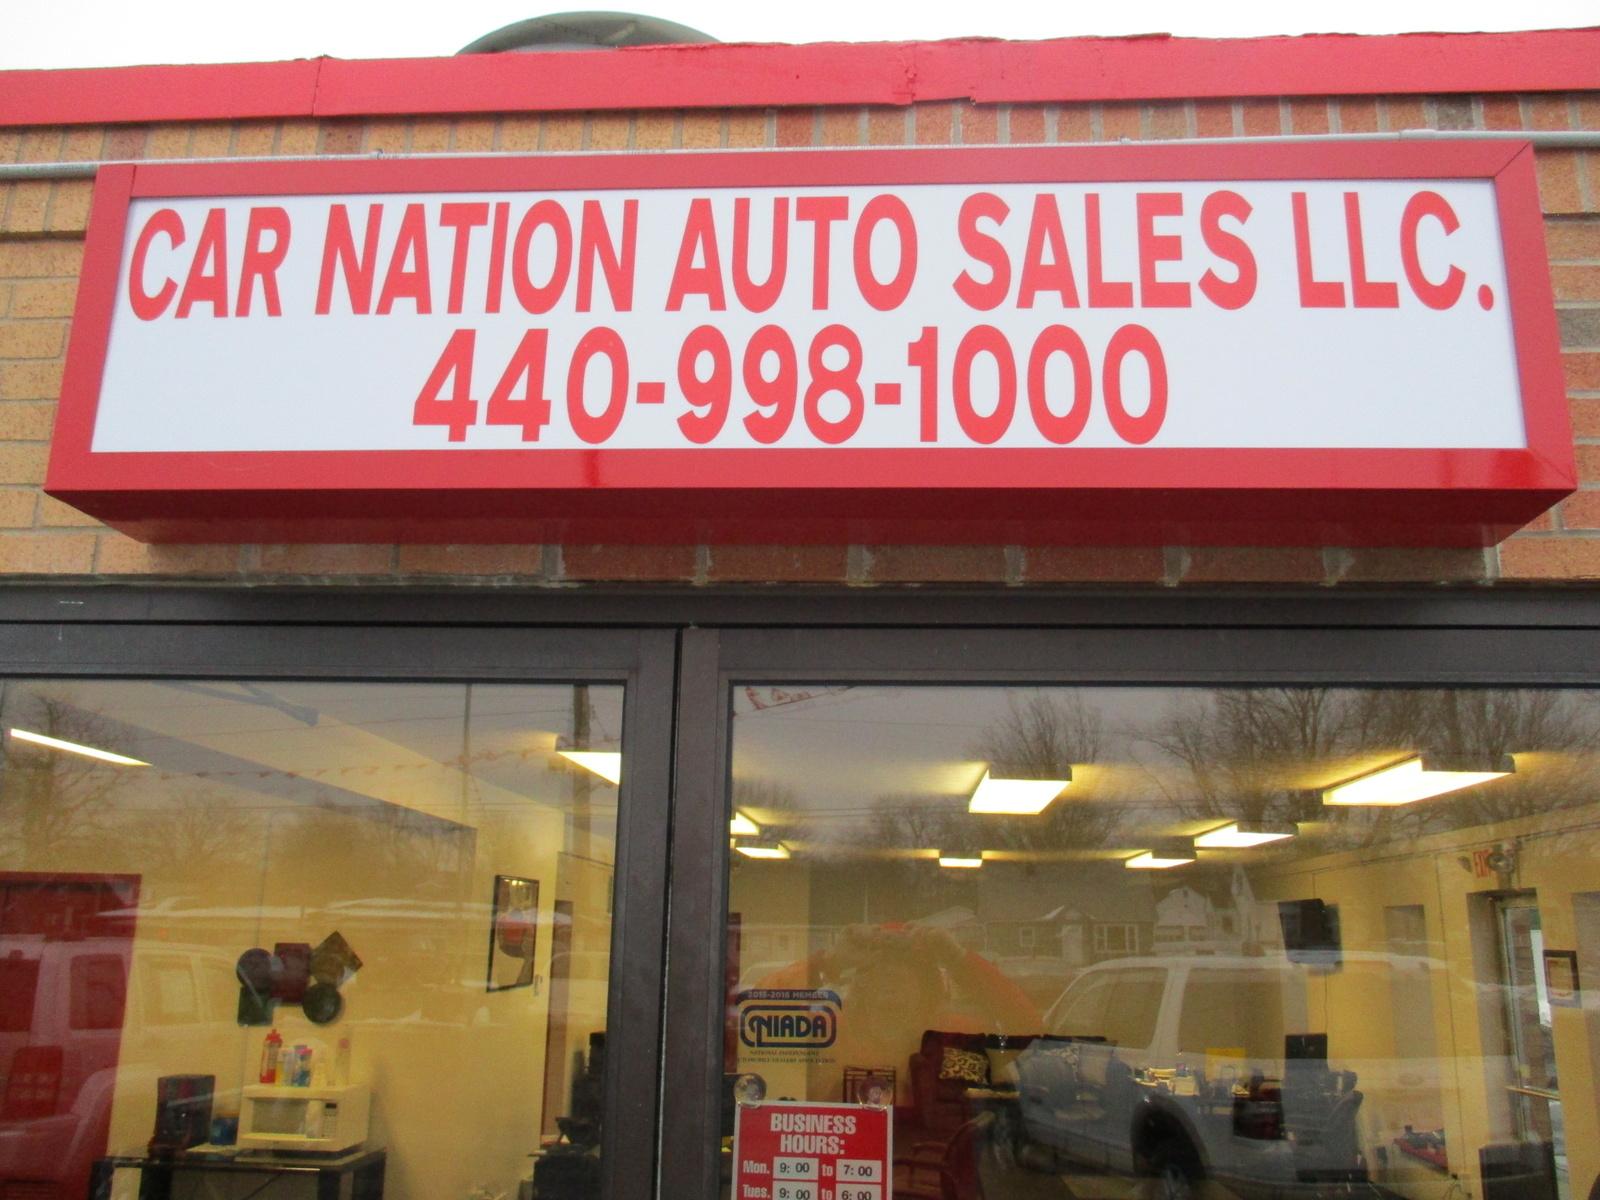 Car Nation Auto Sales LLC Ashtabula OH Read Consumer reviews